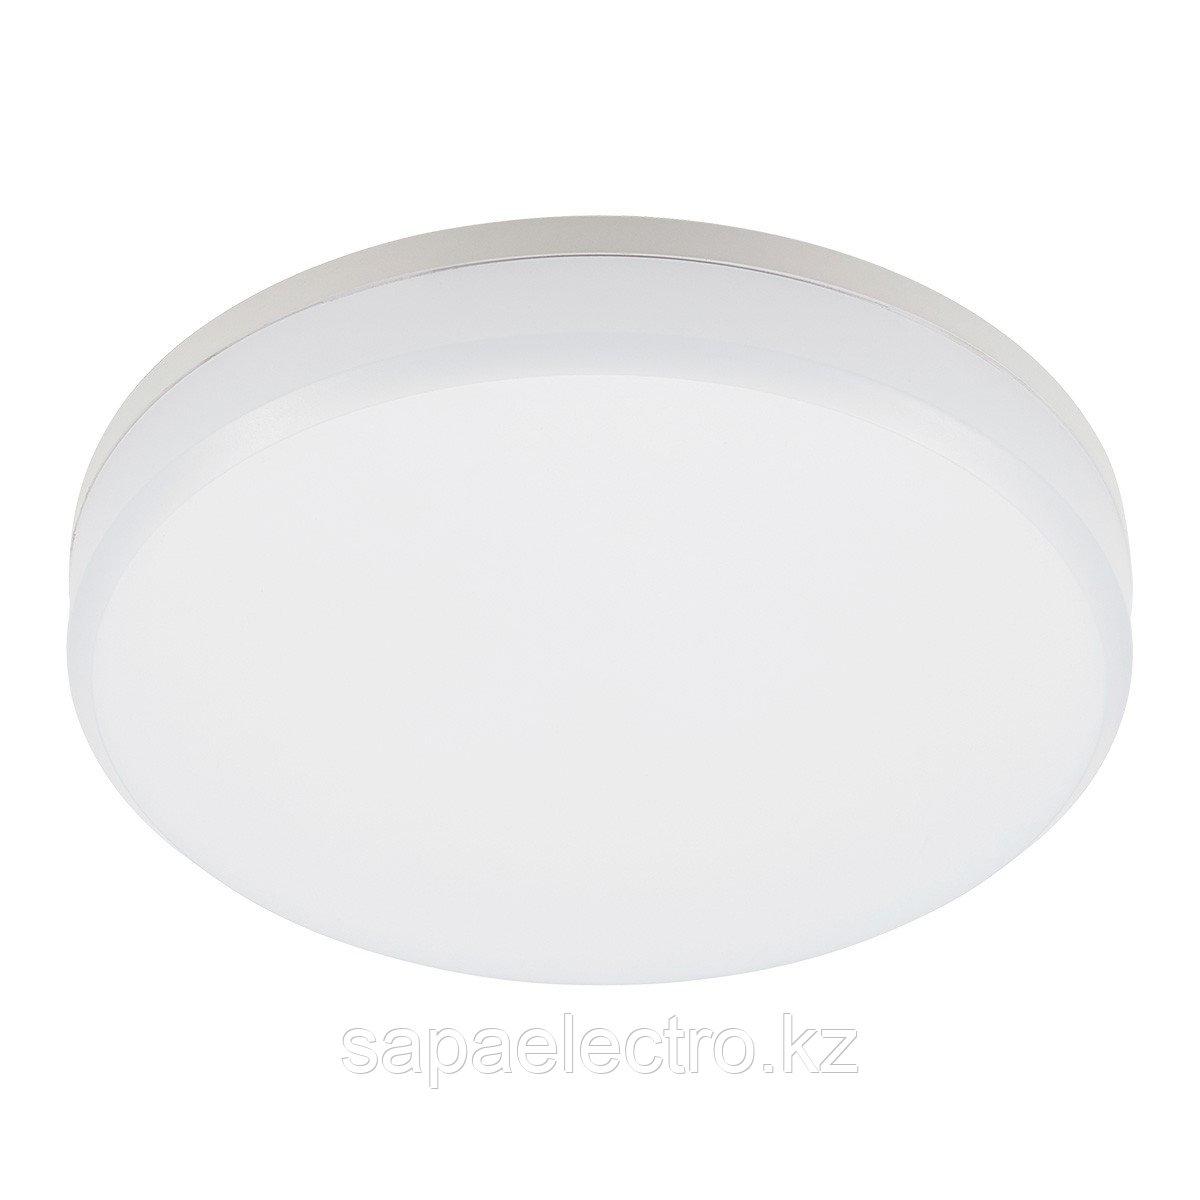 Свет-к LED NIKA ROUND 25W 5500K IP44 (TS) 12шт